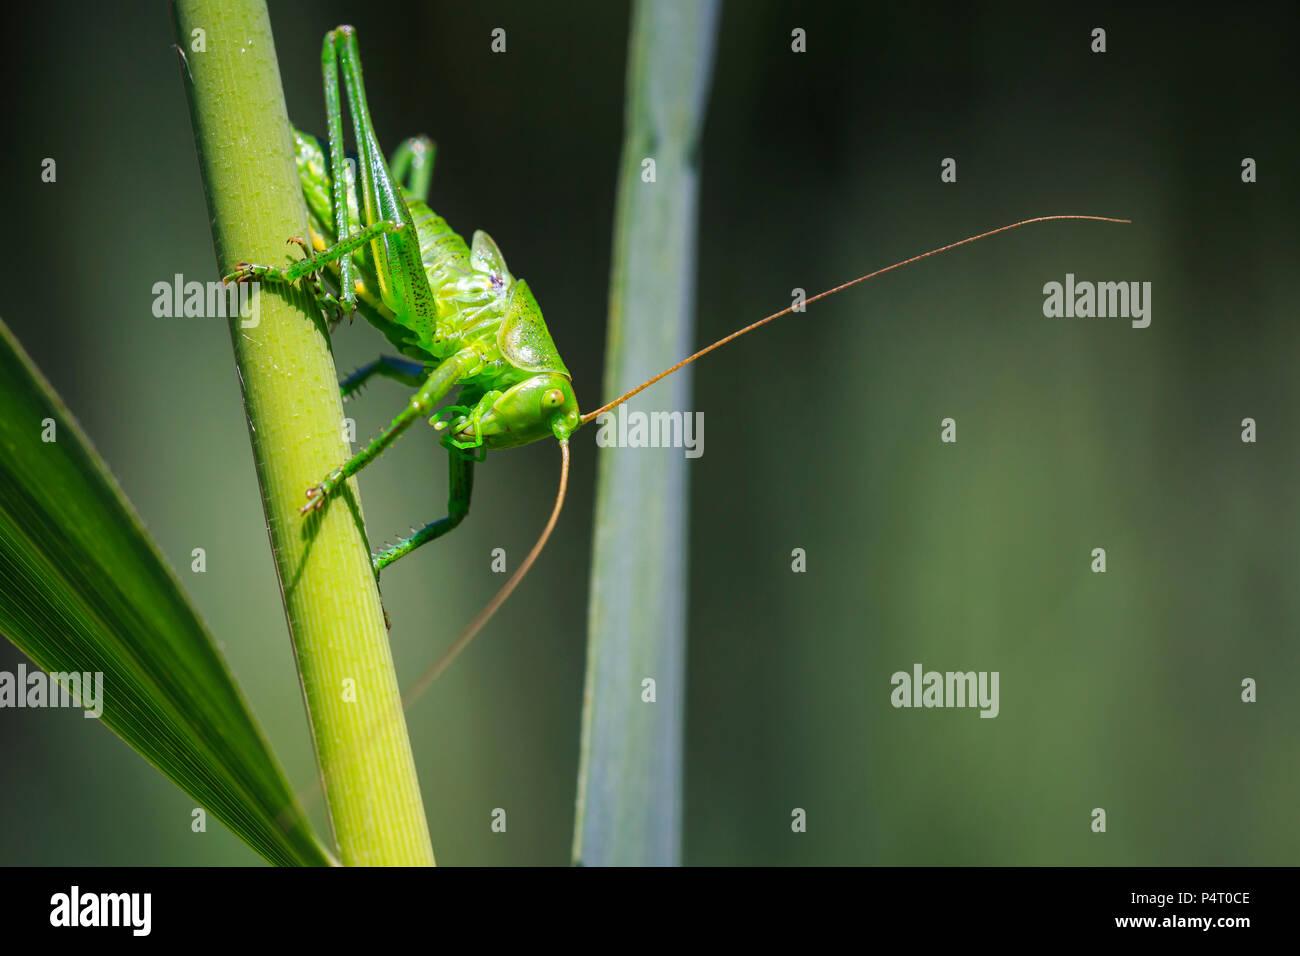 Eine große grüne Bush-Cricket, Tettigonia Viridissima Makro Nahaufnahme. Stockbild